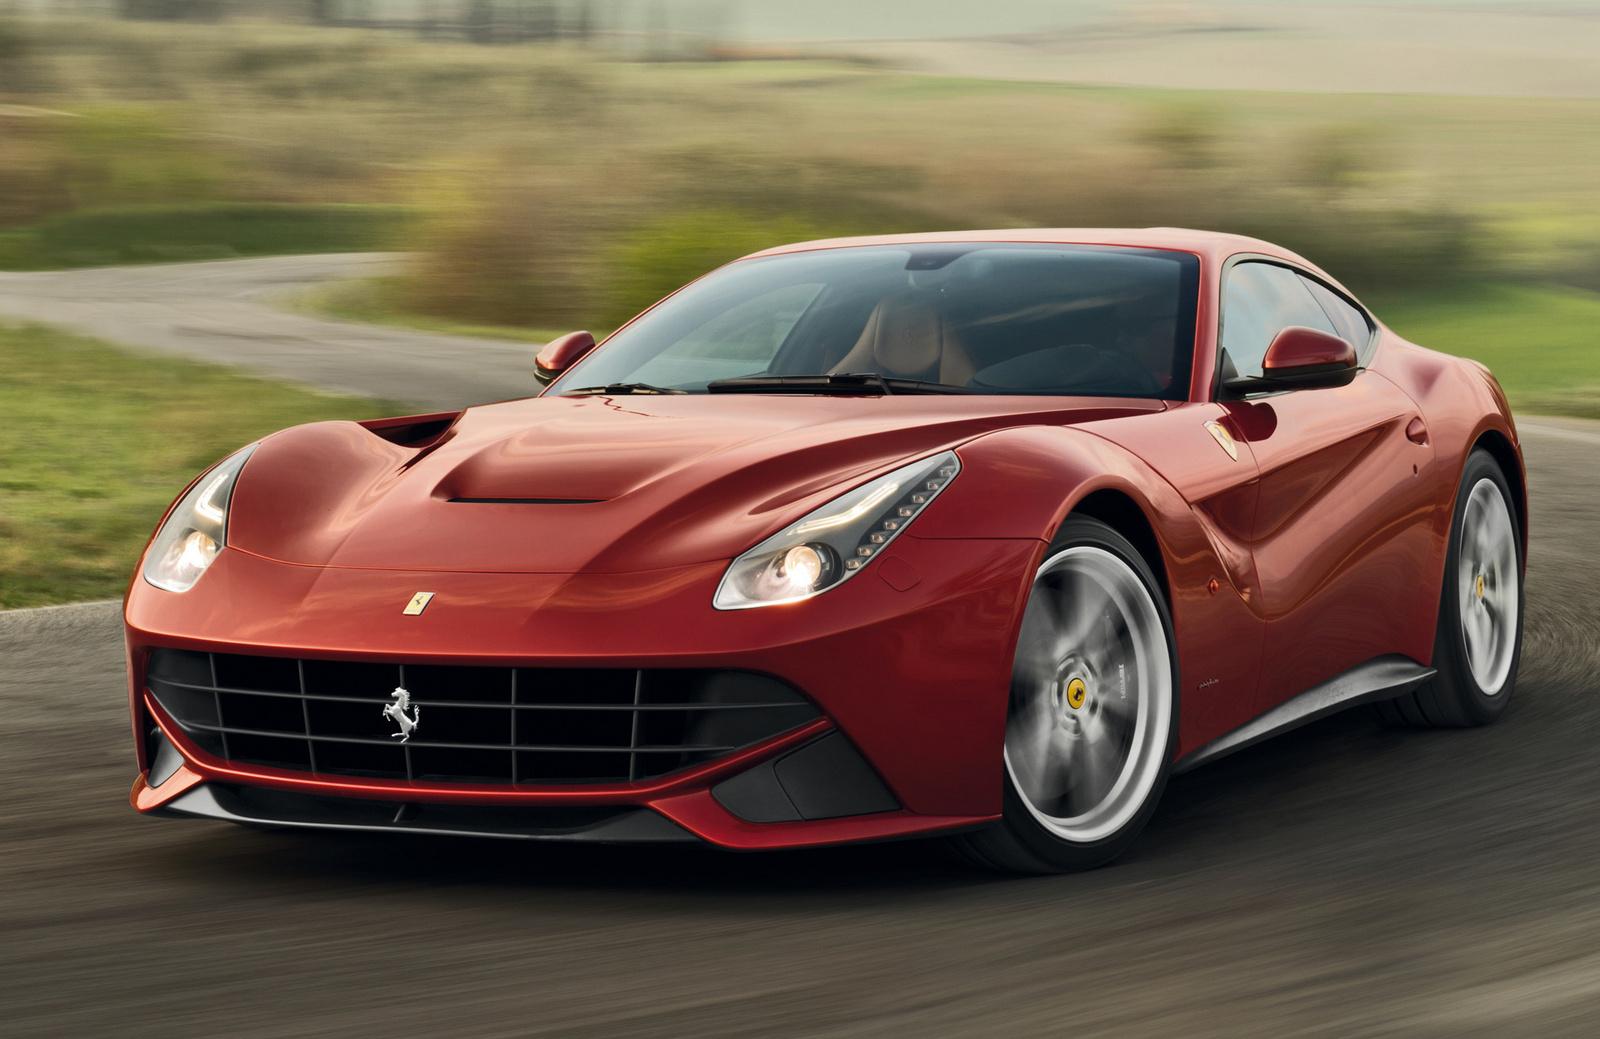 2014 Ferrari F12berlinetta Review Cargurus